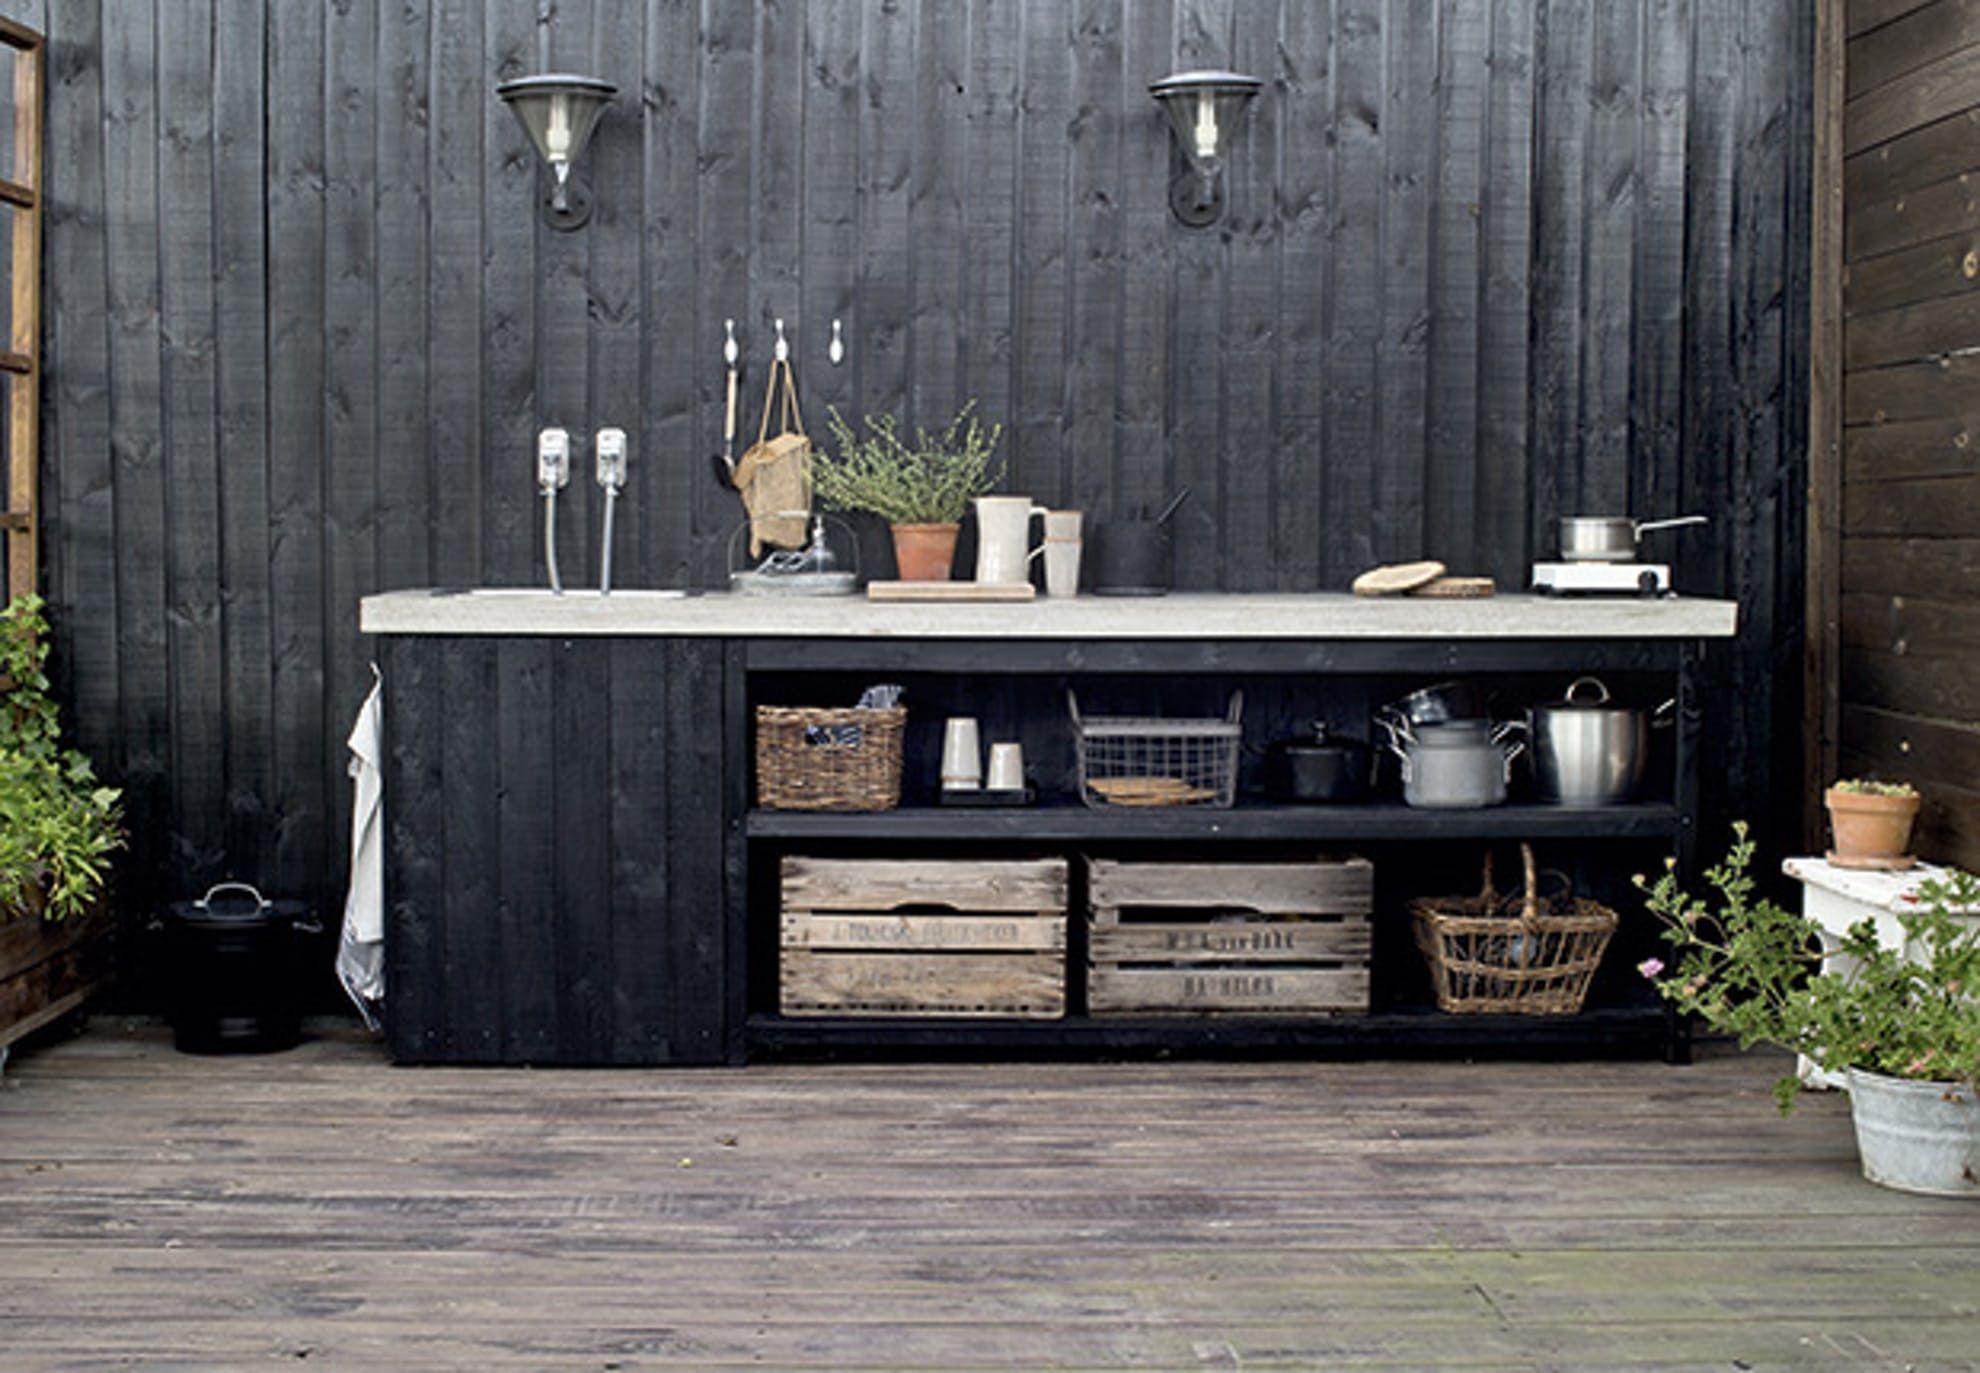 Kolonihavehuset, Der Ligner En Gammel Togvogn. Vegetables GardenModern  Outdoor KitchenPatio ...